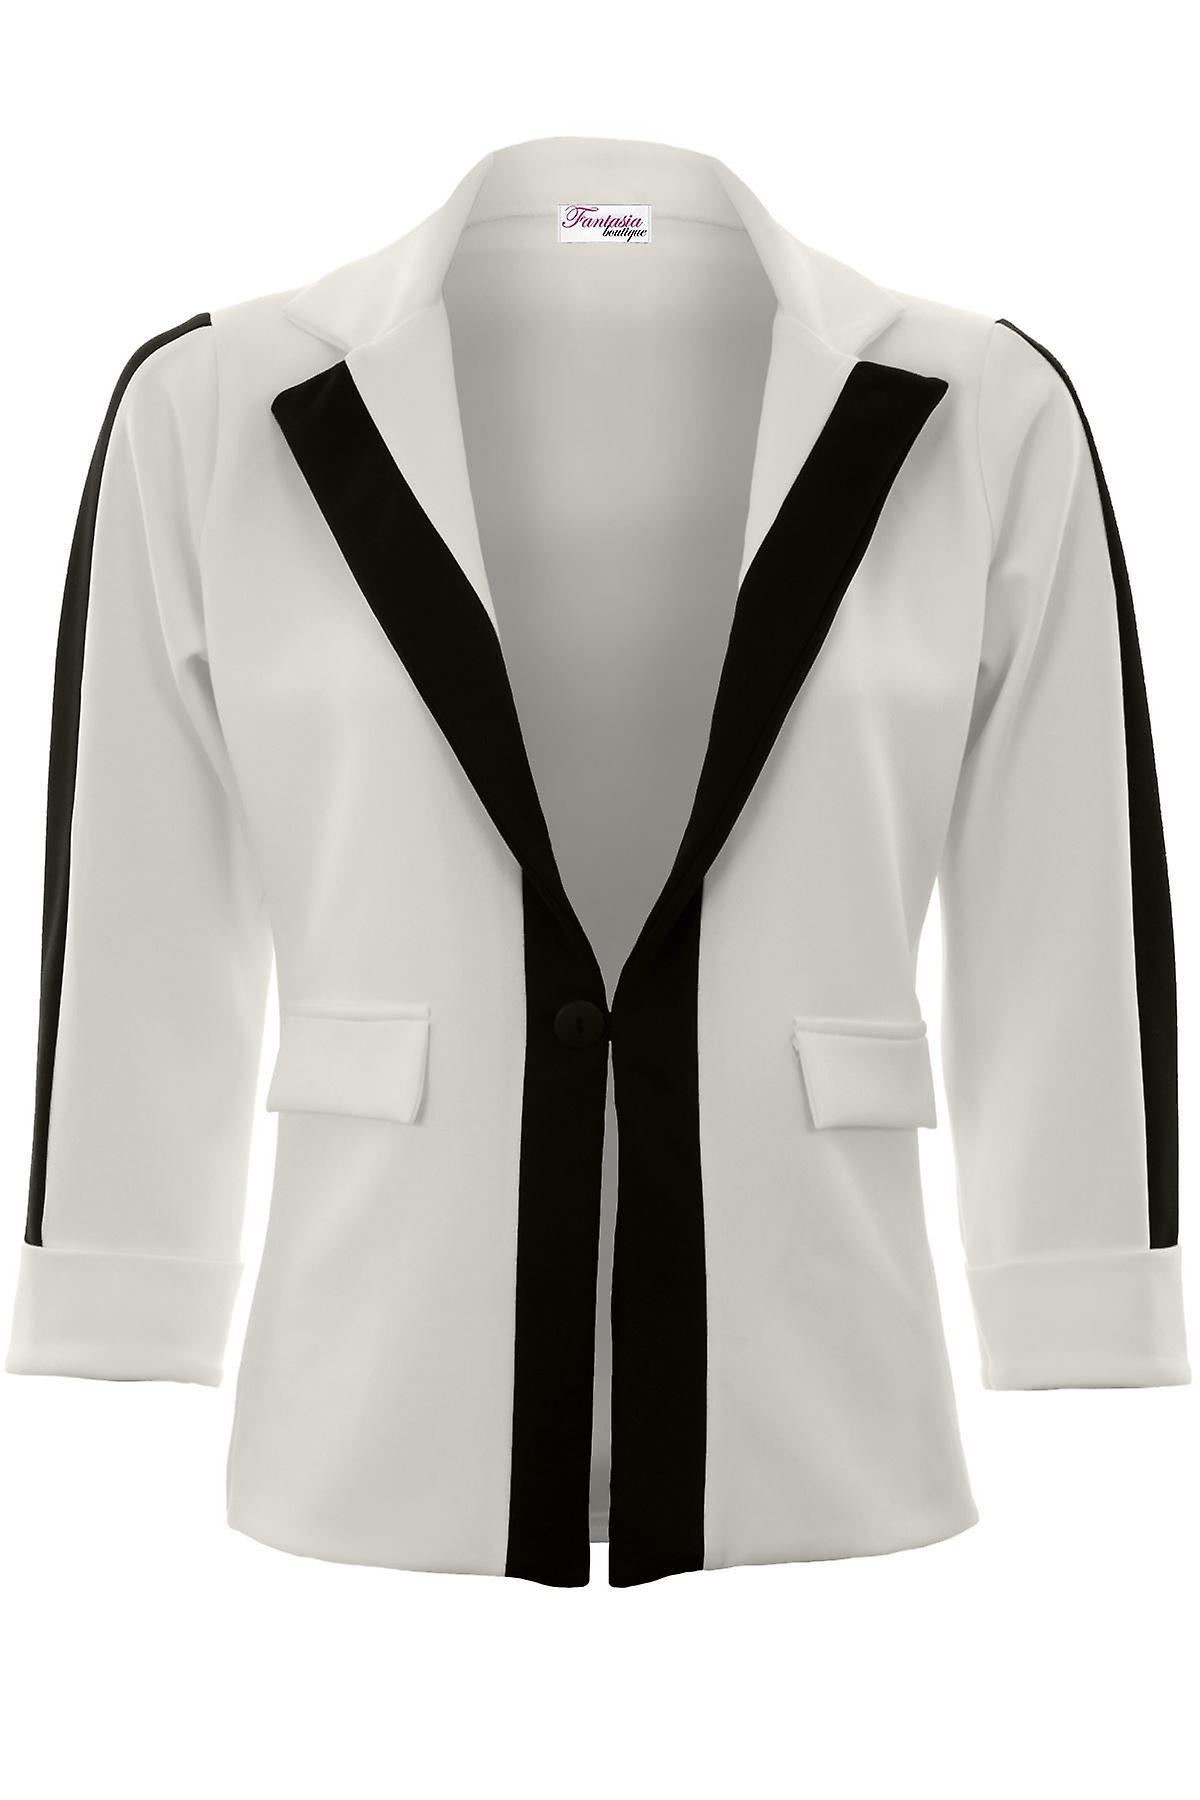 Ladies Turn Up 3/4 Sleeve Monochrome Panel Contrast One Button Blazer Jacket